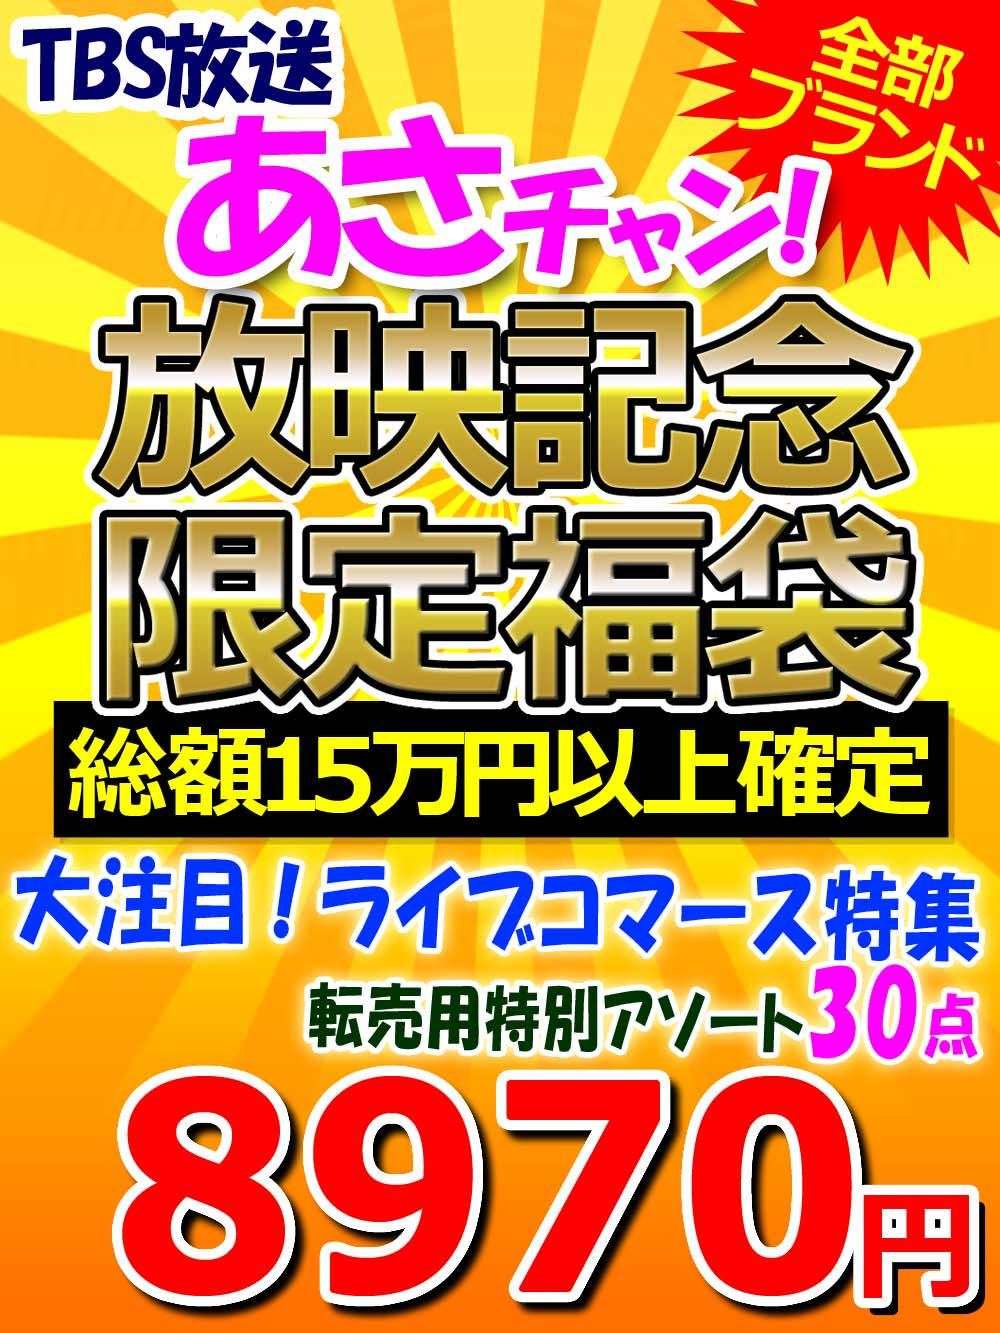 【TBSあさチャン!ライブコマース特集】放映記念特別福袋 総額15万円以上確定!【転売用30点】8970